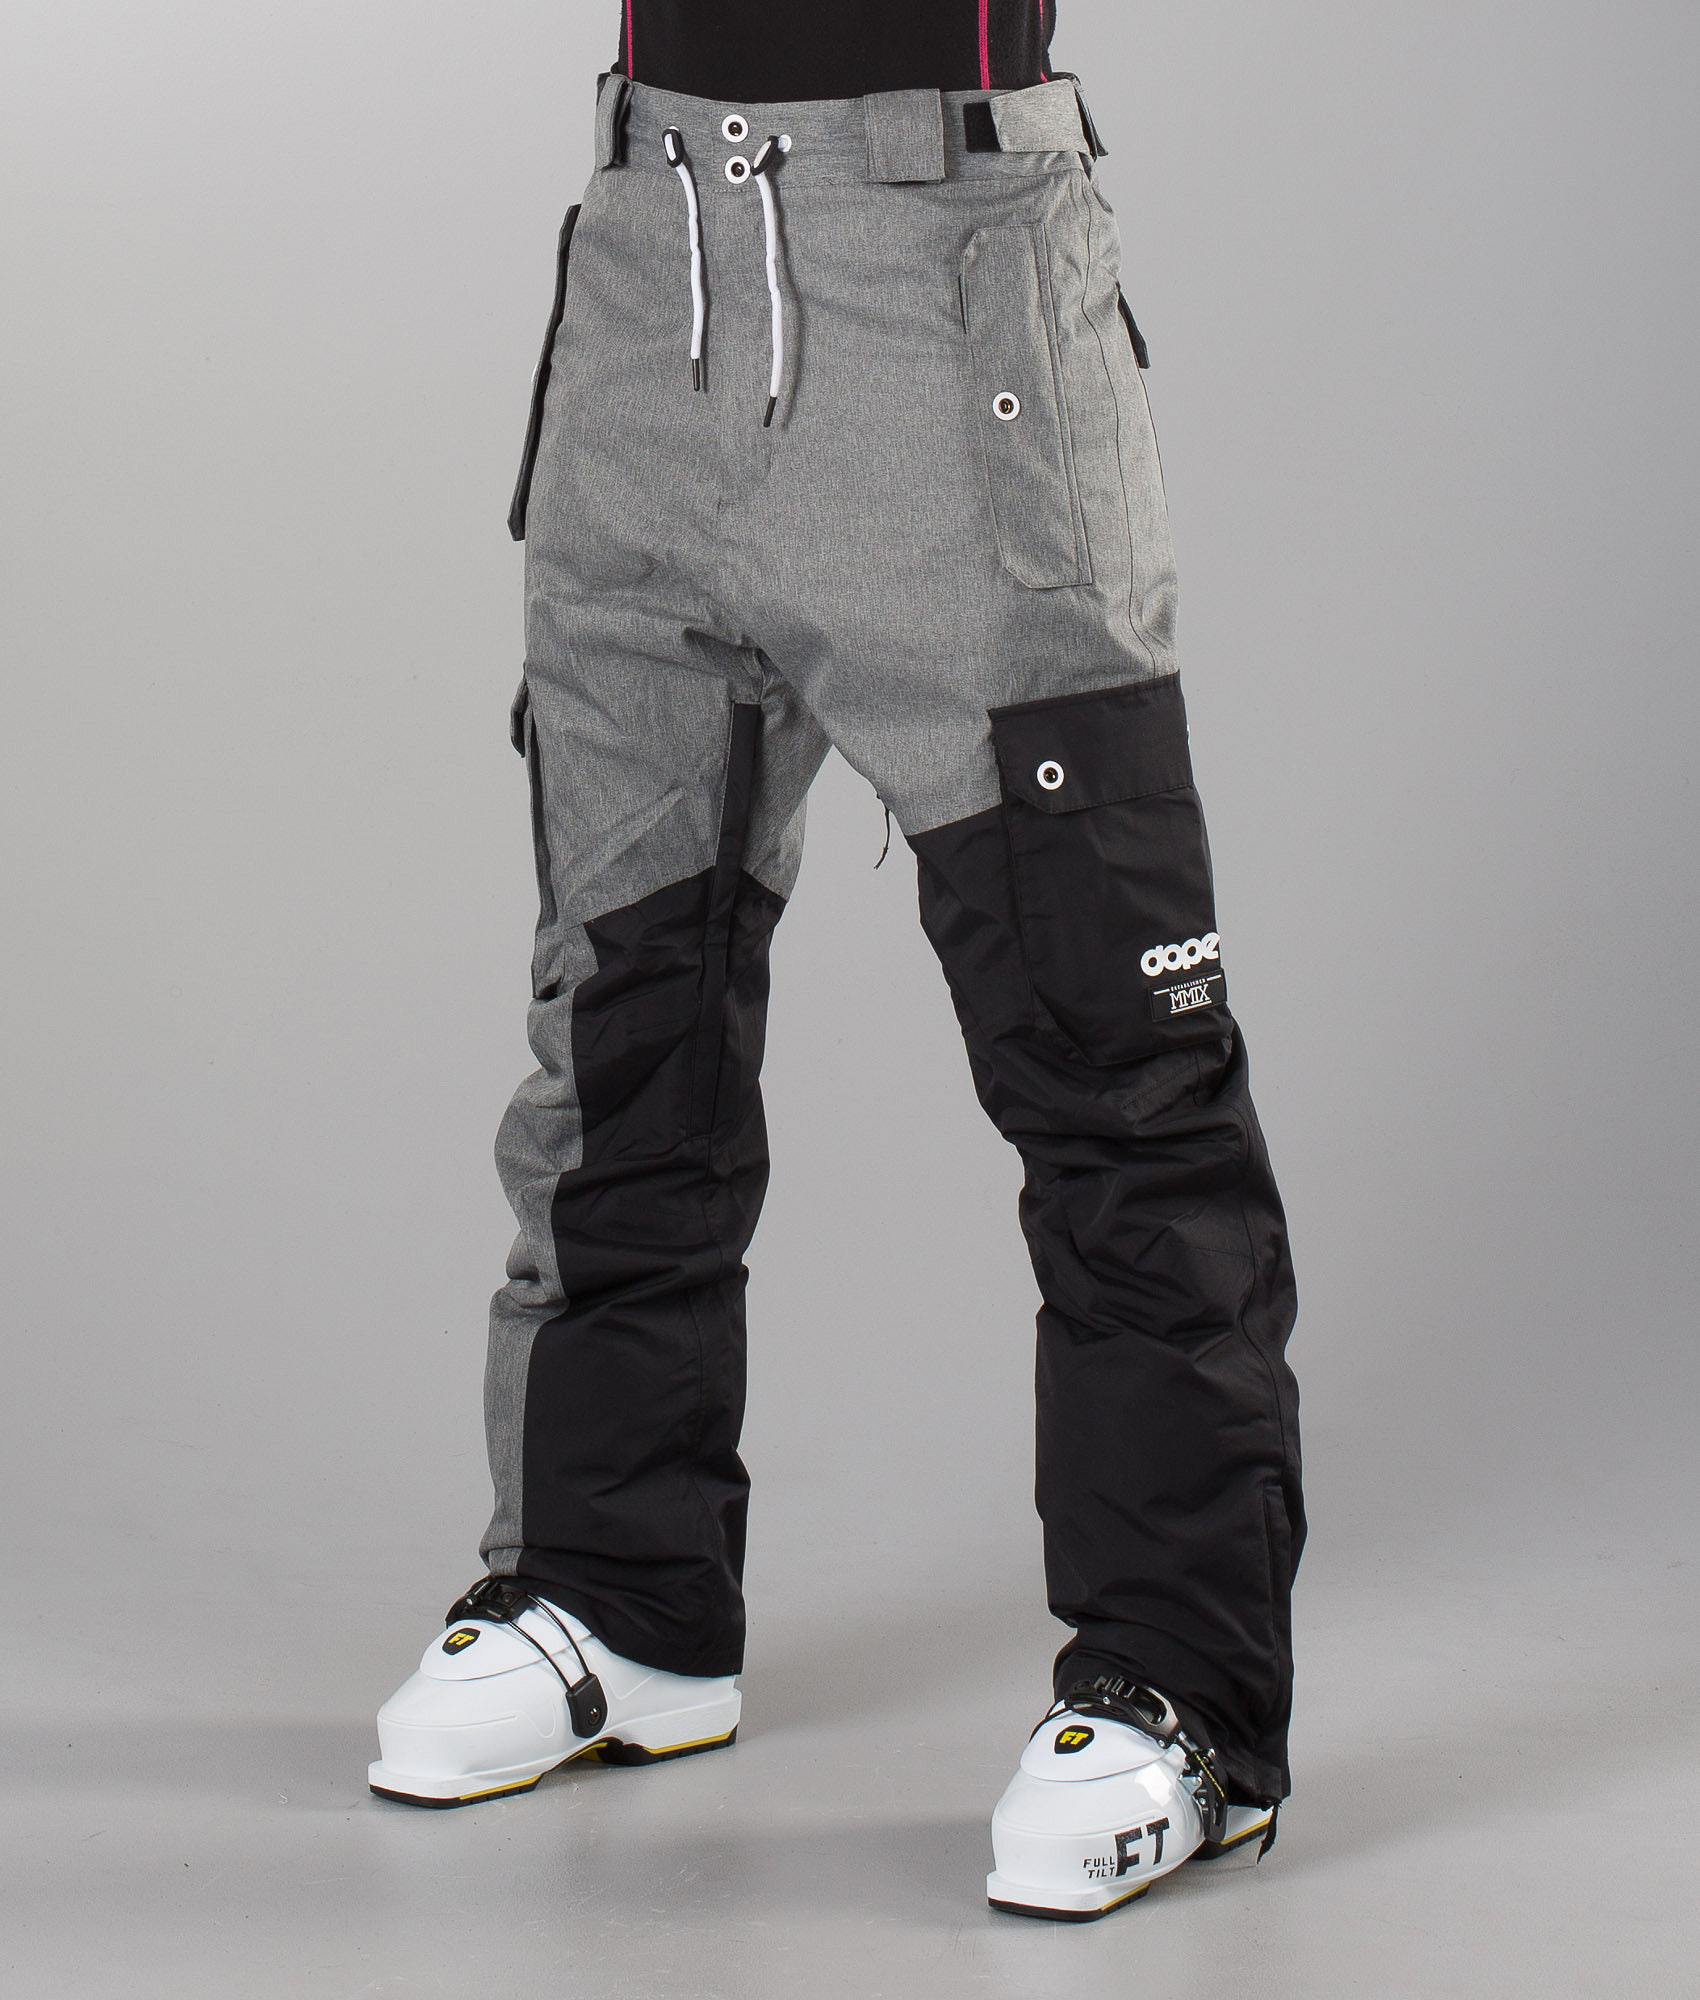 aea306c070 Dope Adept Unisex Ski Pants Black Greymelange - Ridestore.com